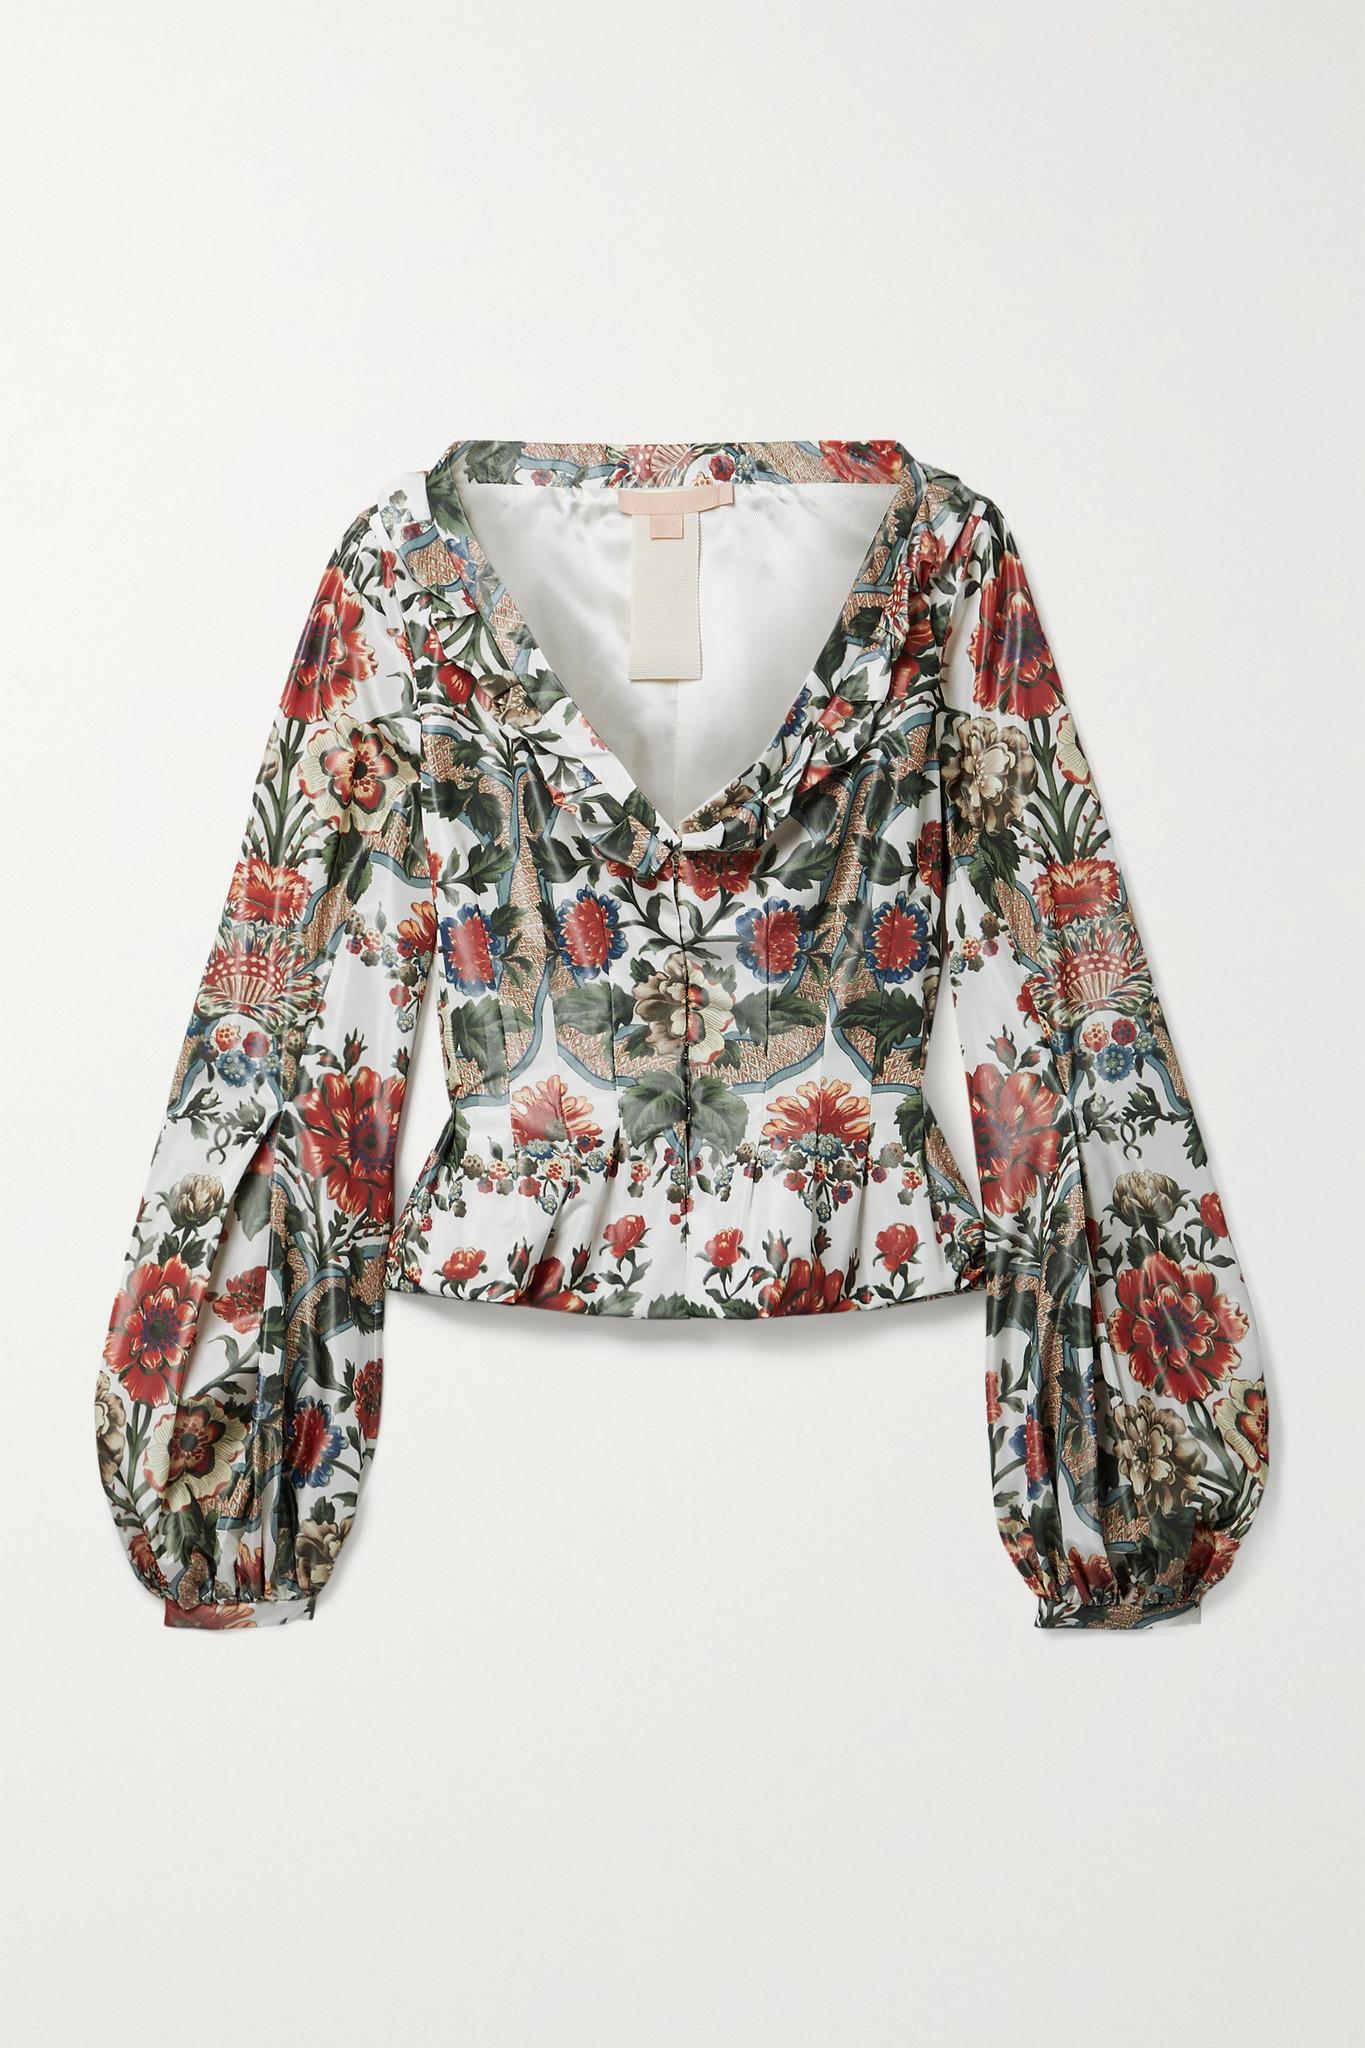 BROCK COLLECTION - Sabrina Ruffled Floral-print Taffeta Jacket - Green - US0